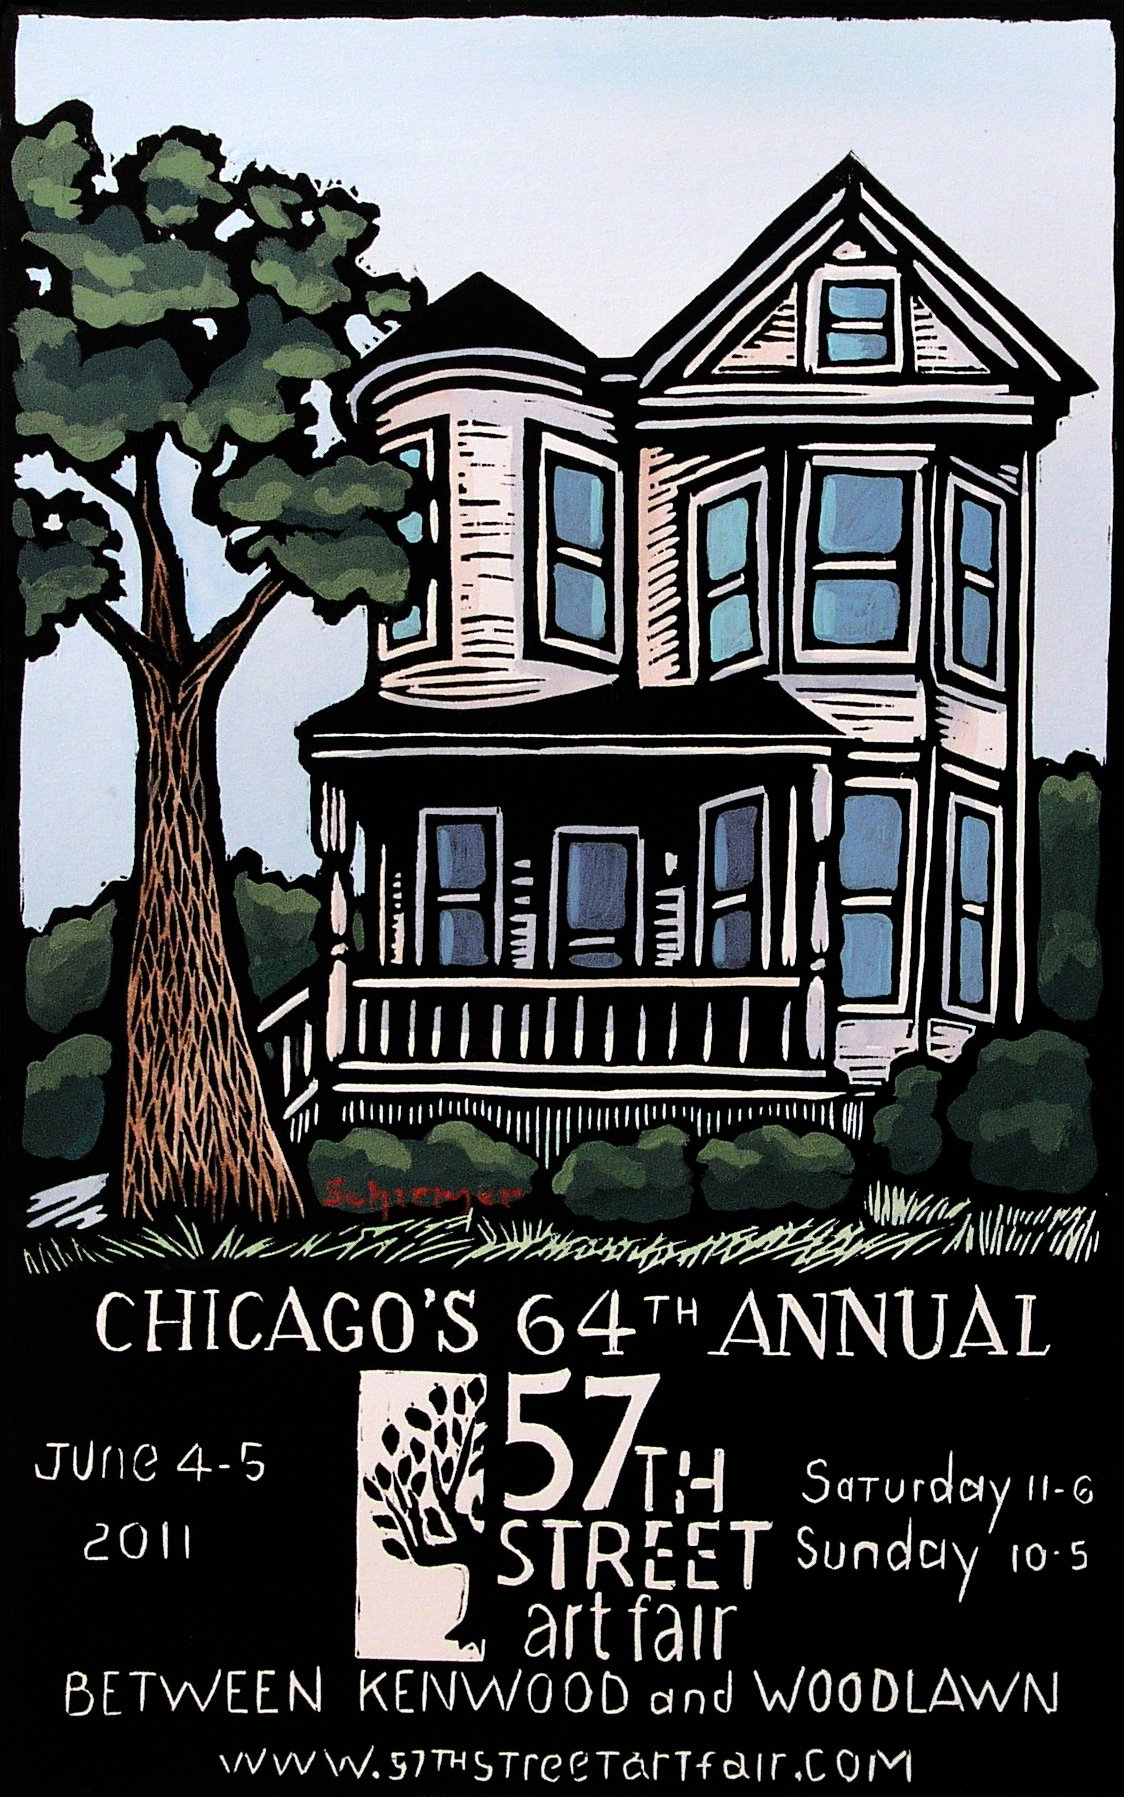 2011 Poster by John Schirmer